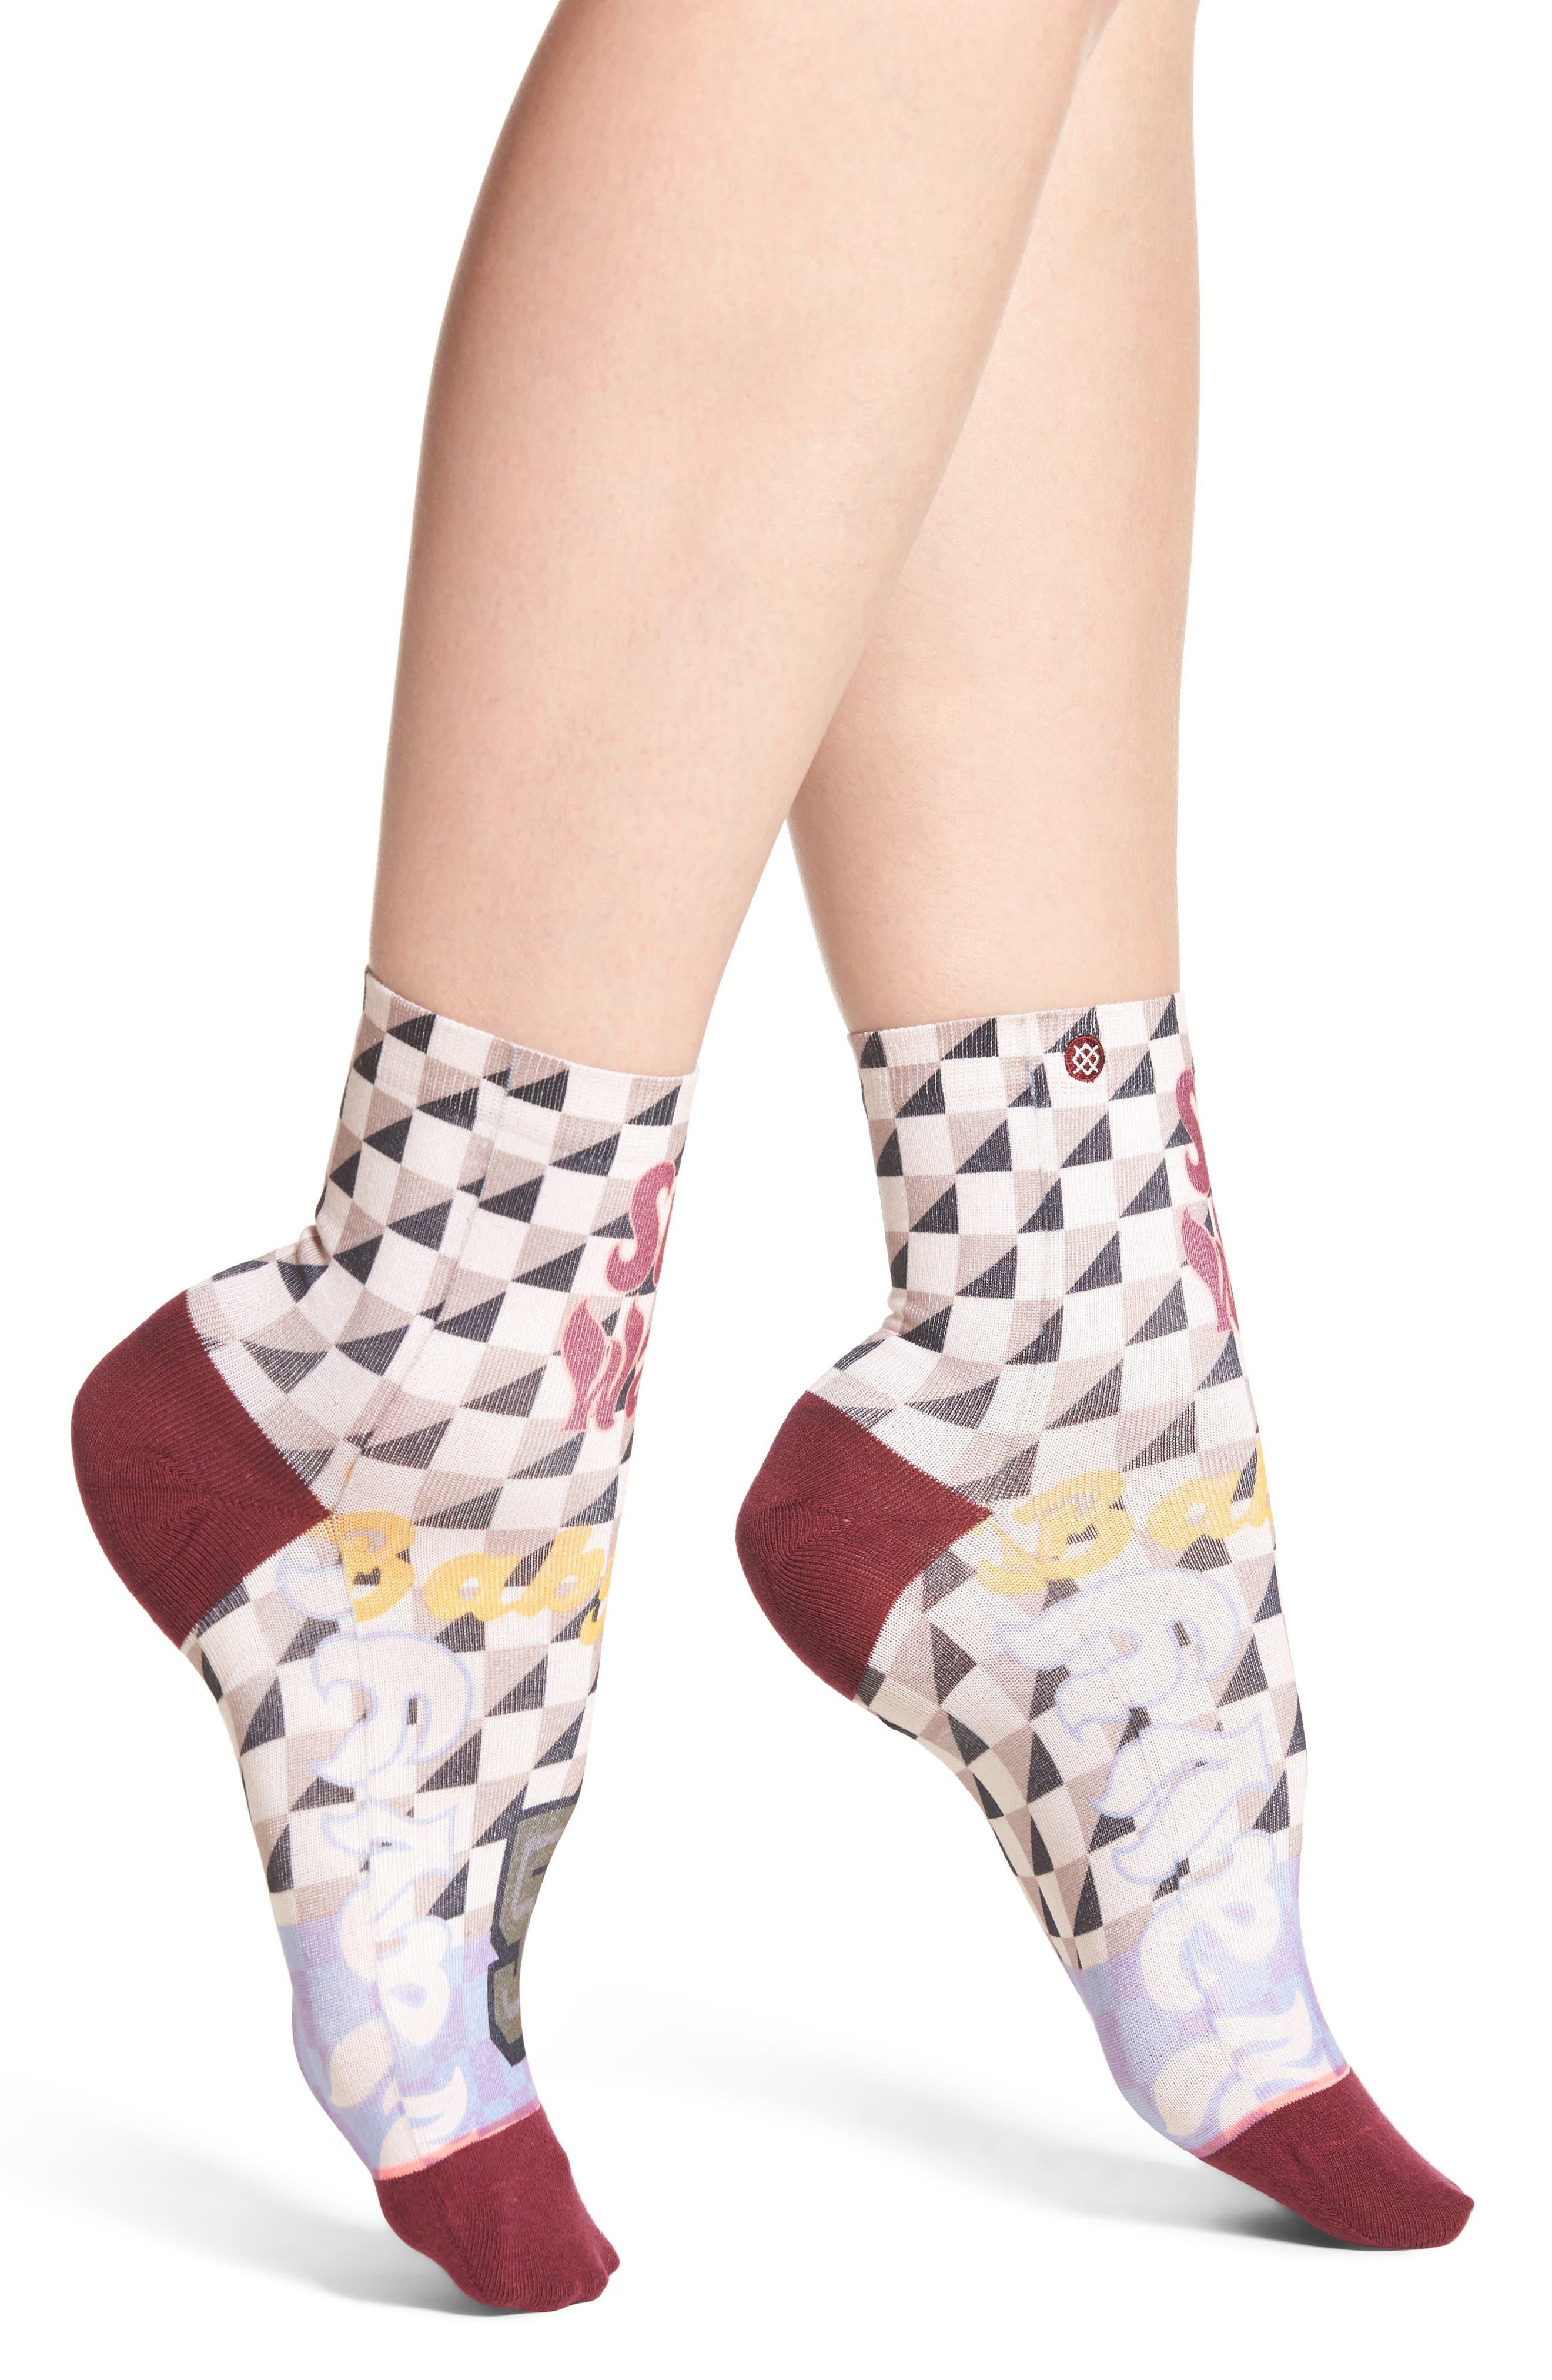 Lowrider Supa Wavy Socks,                             Alternate thumbnail 2, color,                             White Multi